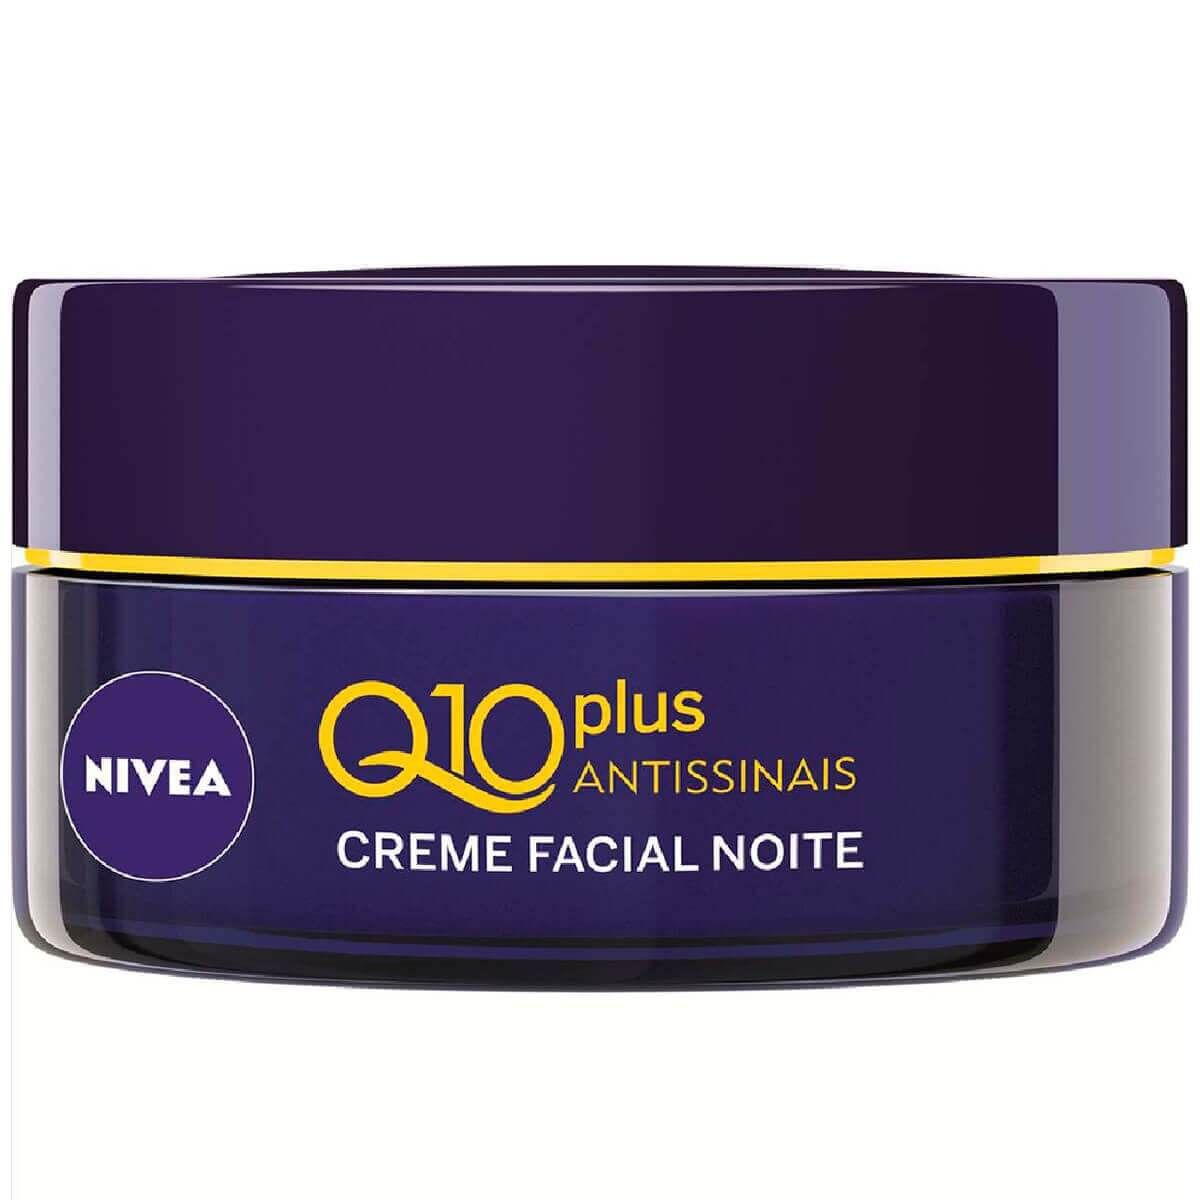 Creme Facial Q10 Antissinais Noite Fps 30 - 53g-Nivea